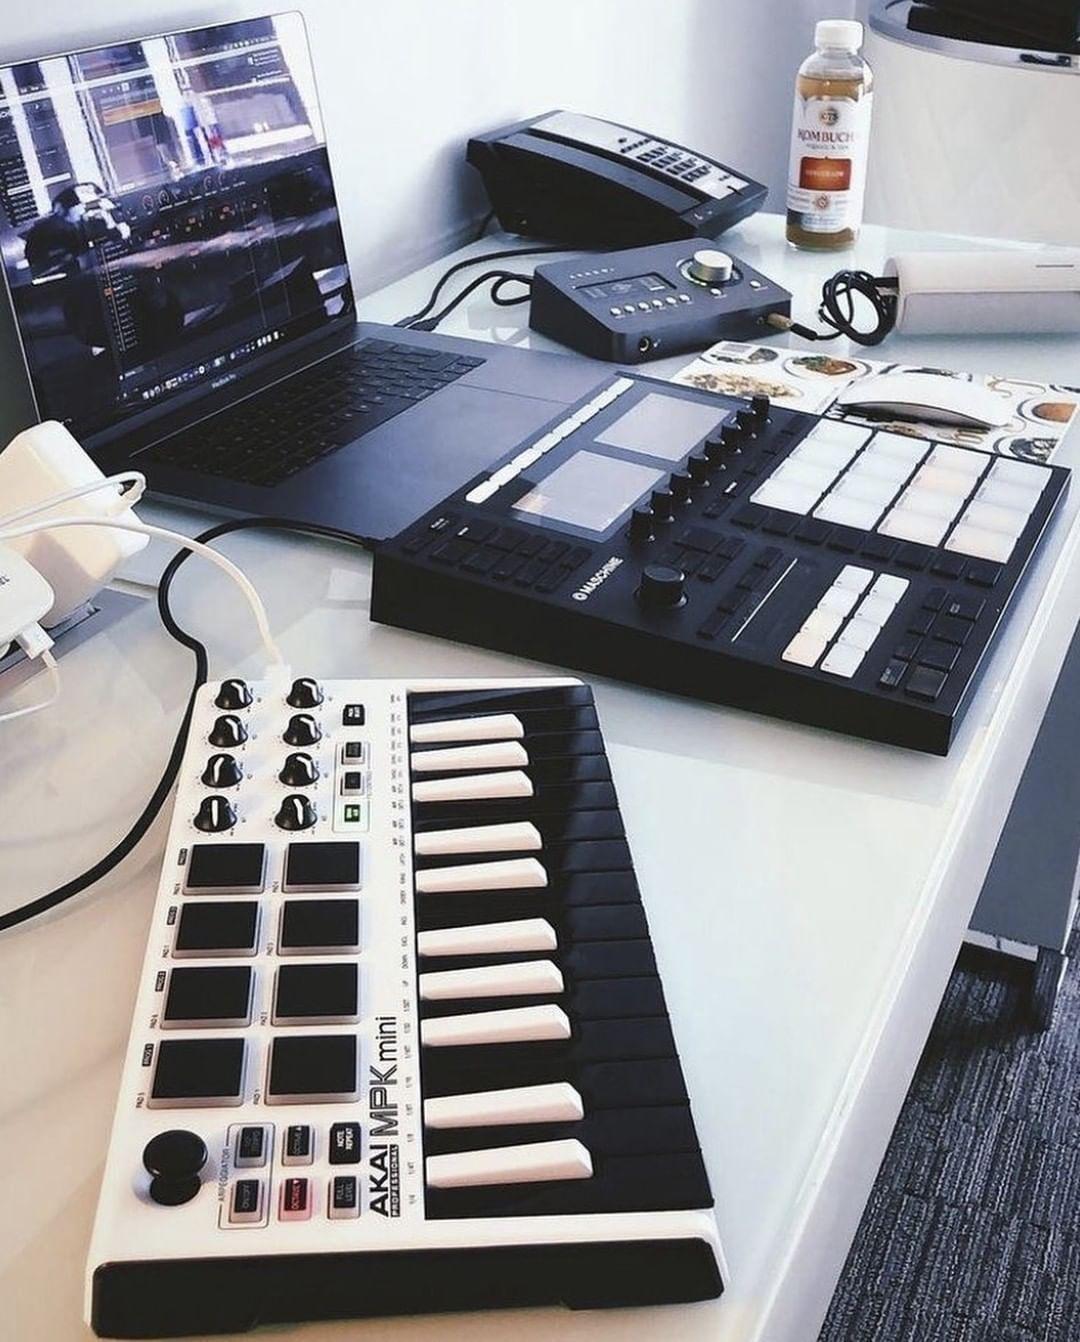 Akai Mpk Mini Mk2 Keyboard Synthesizer Akai Music Studio Room Home Recording Studio Equipment Home Recording Studio Setup